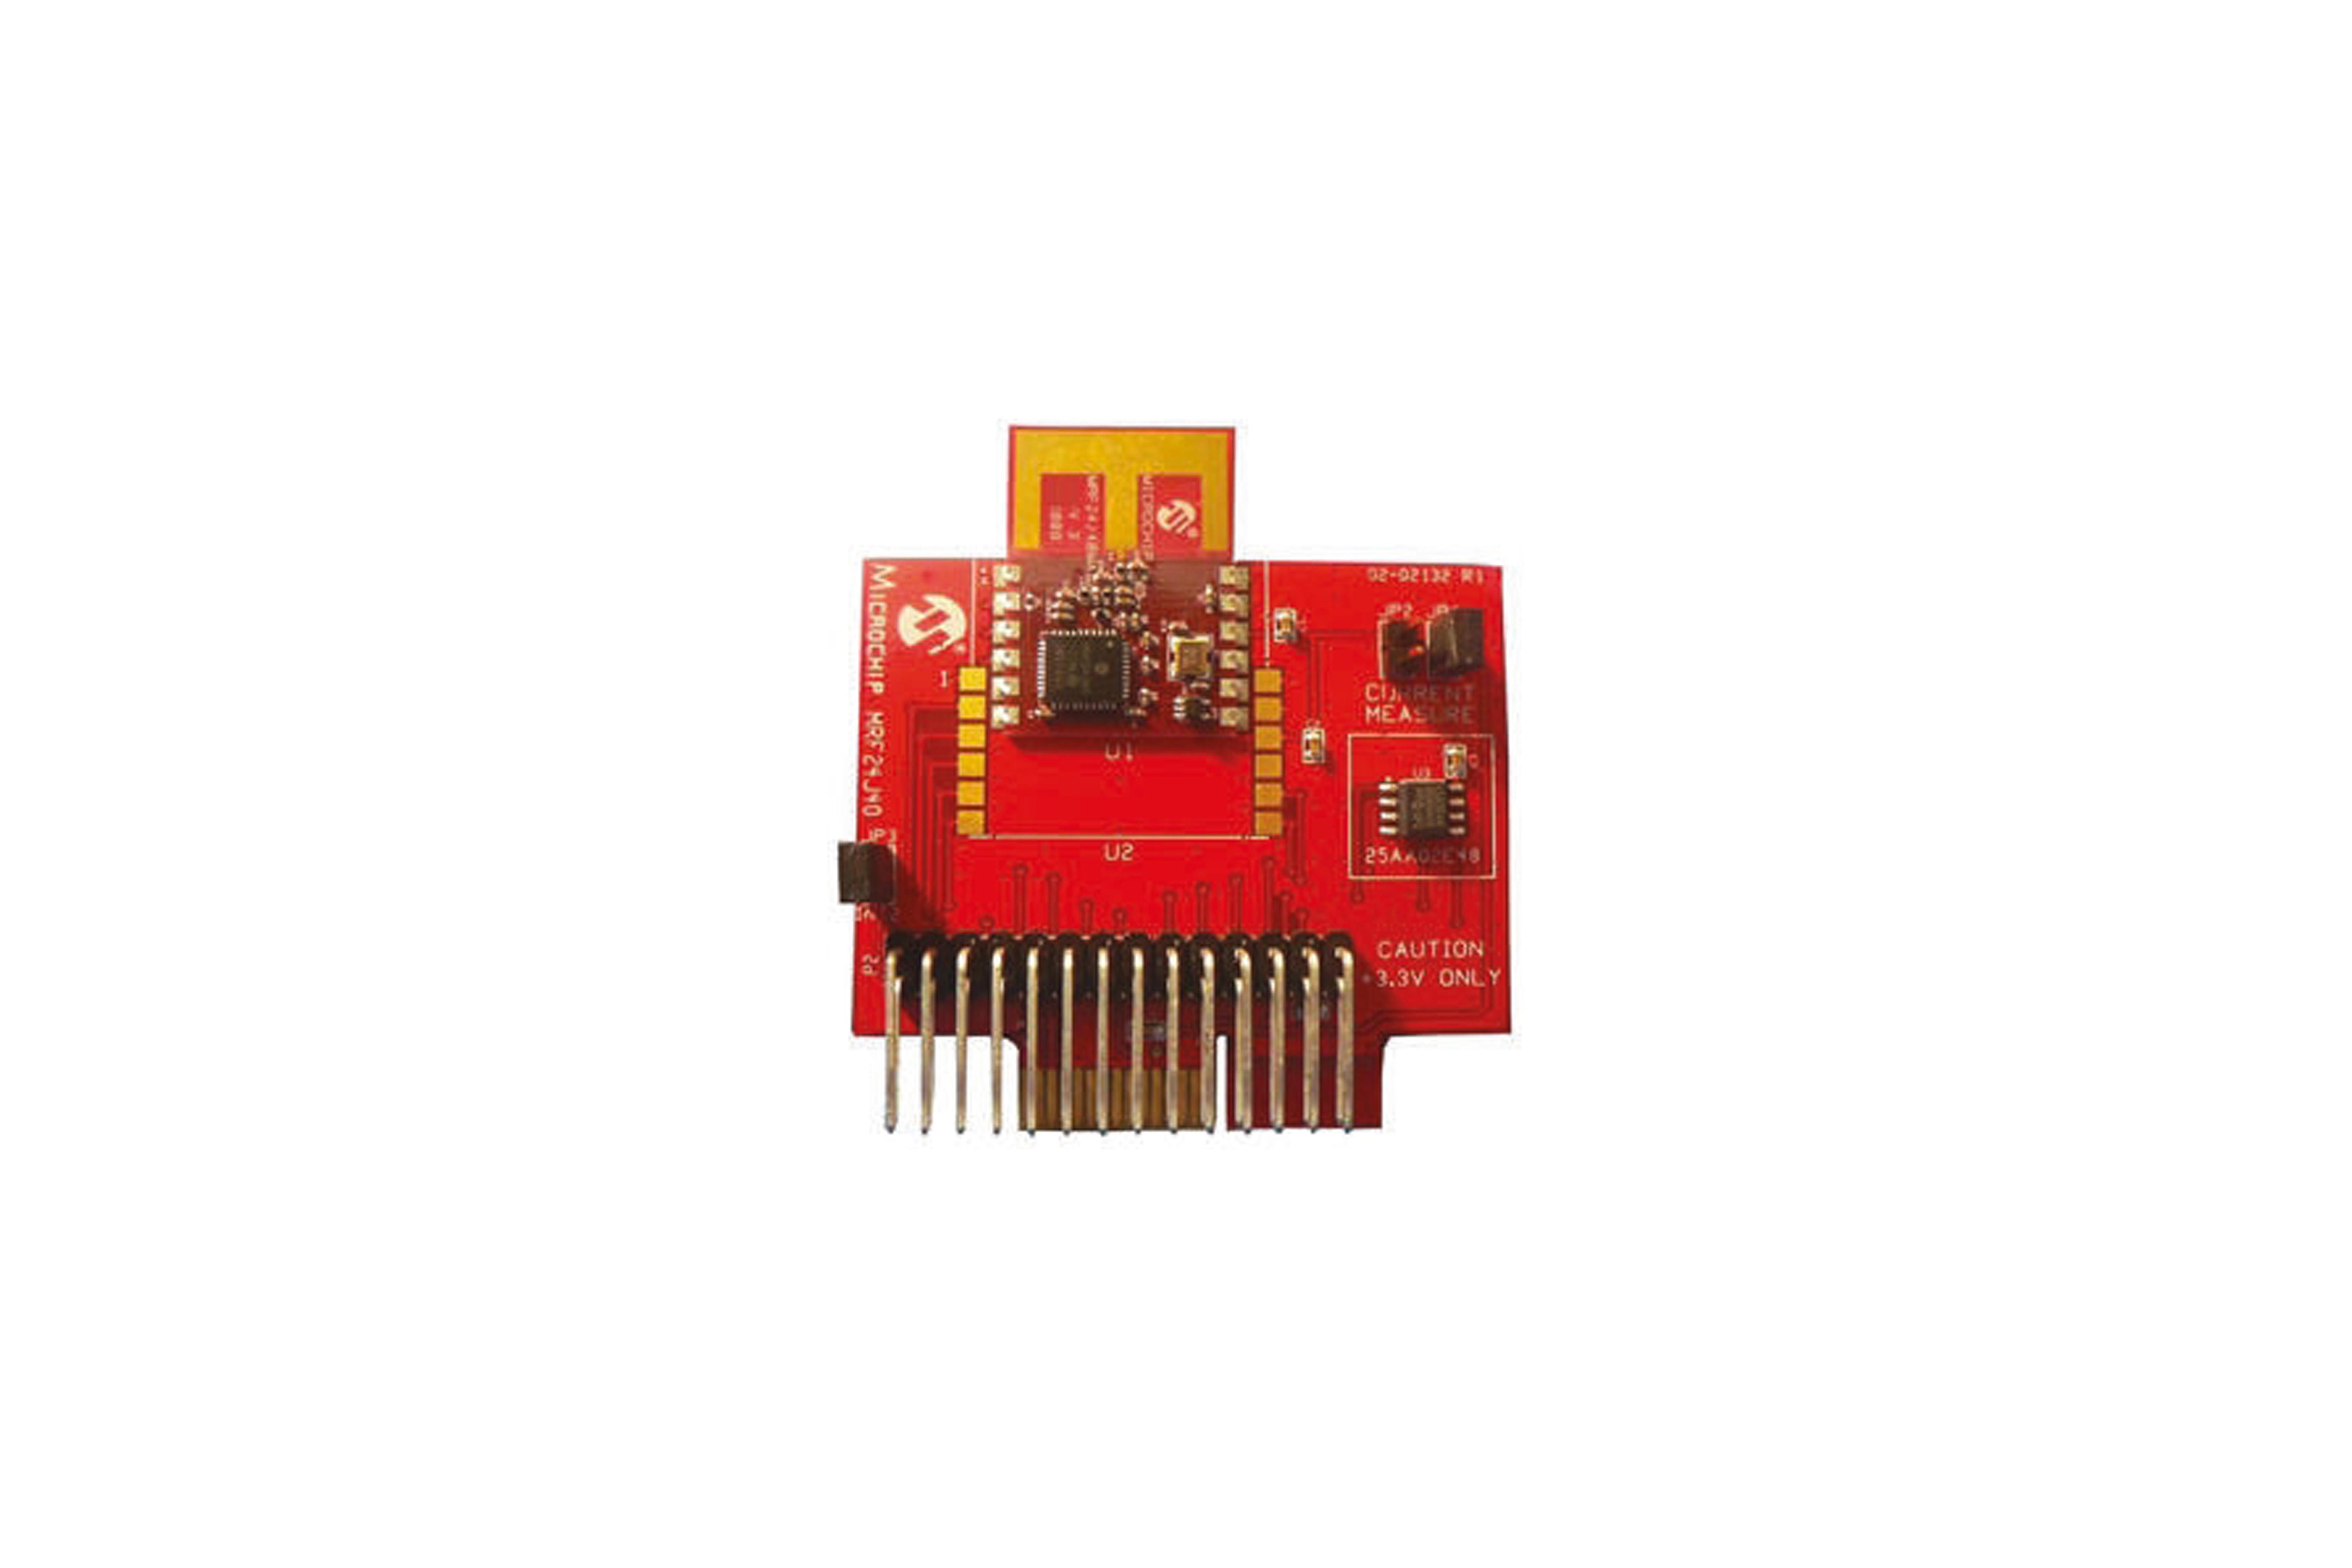 MRF24J40MB PICTAIL PLUS 2.4 GHz HF 0 DB